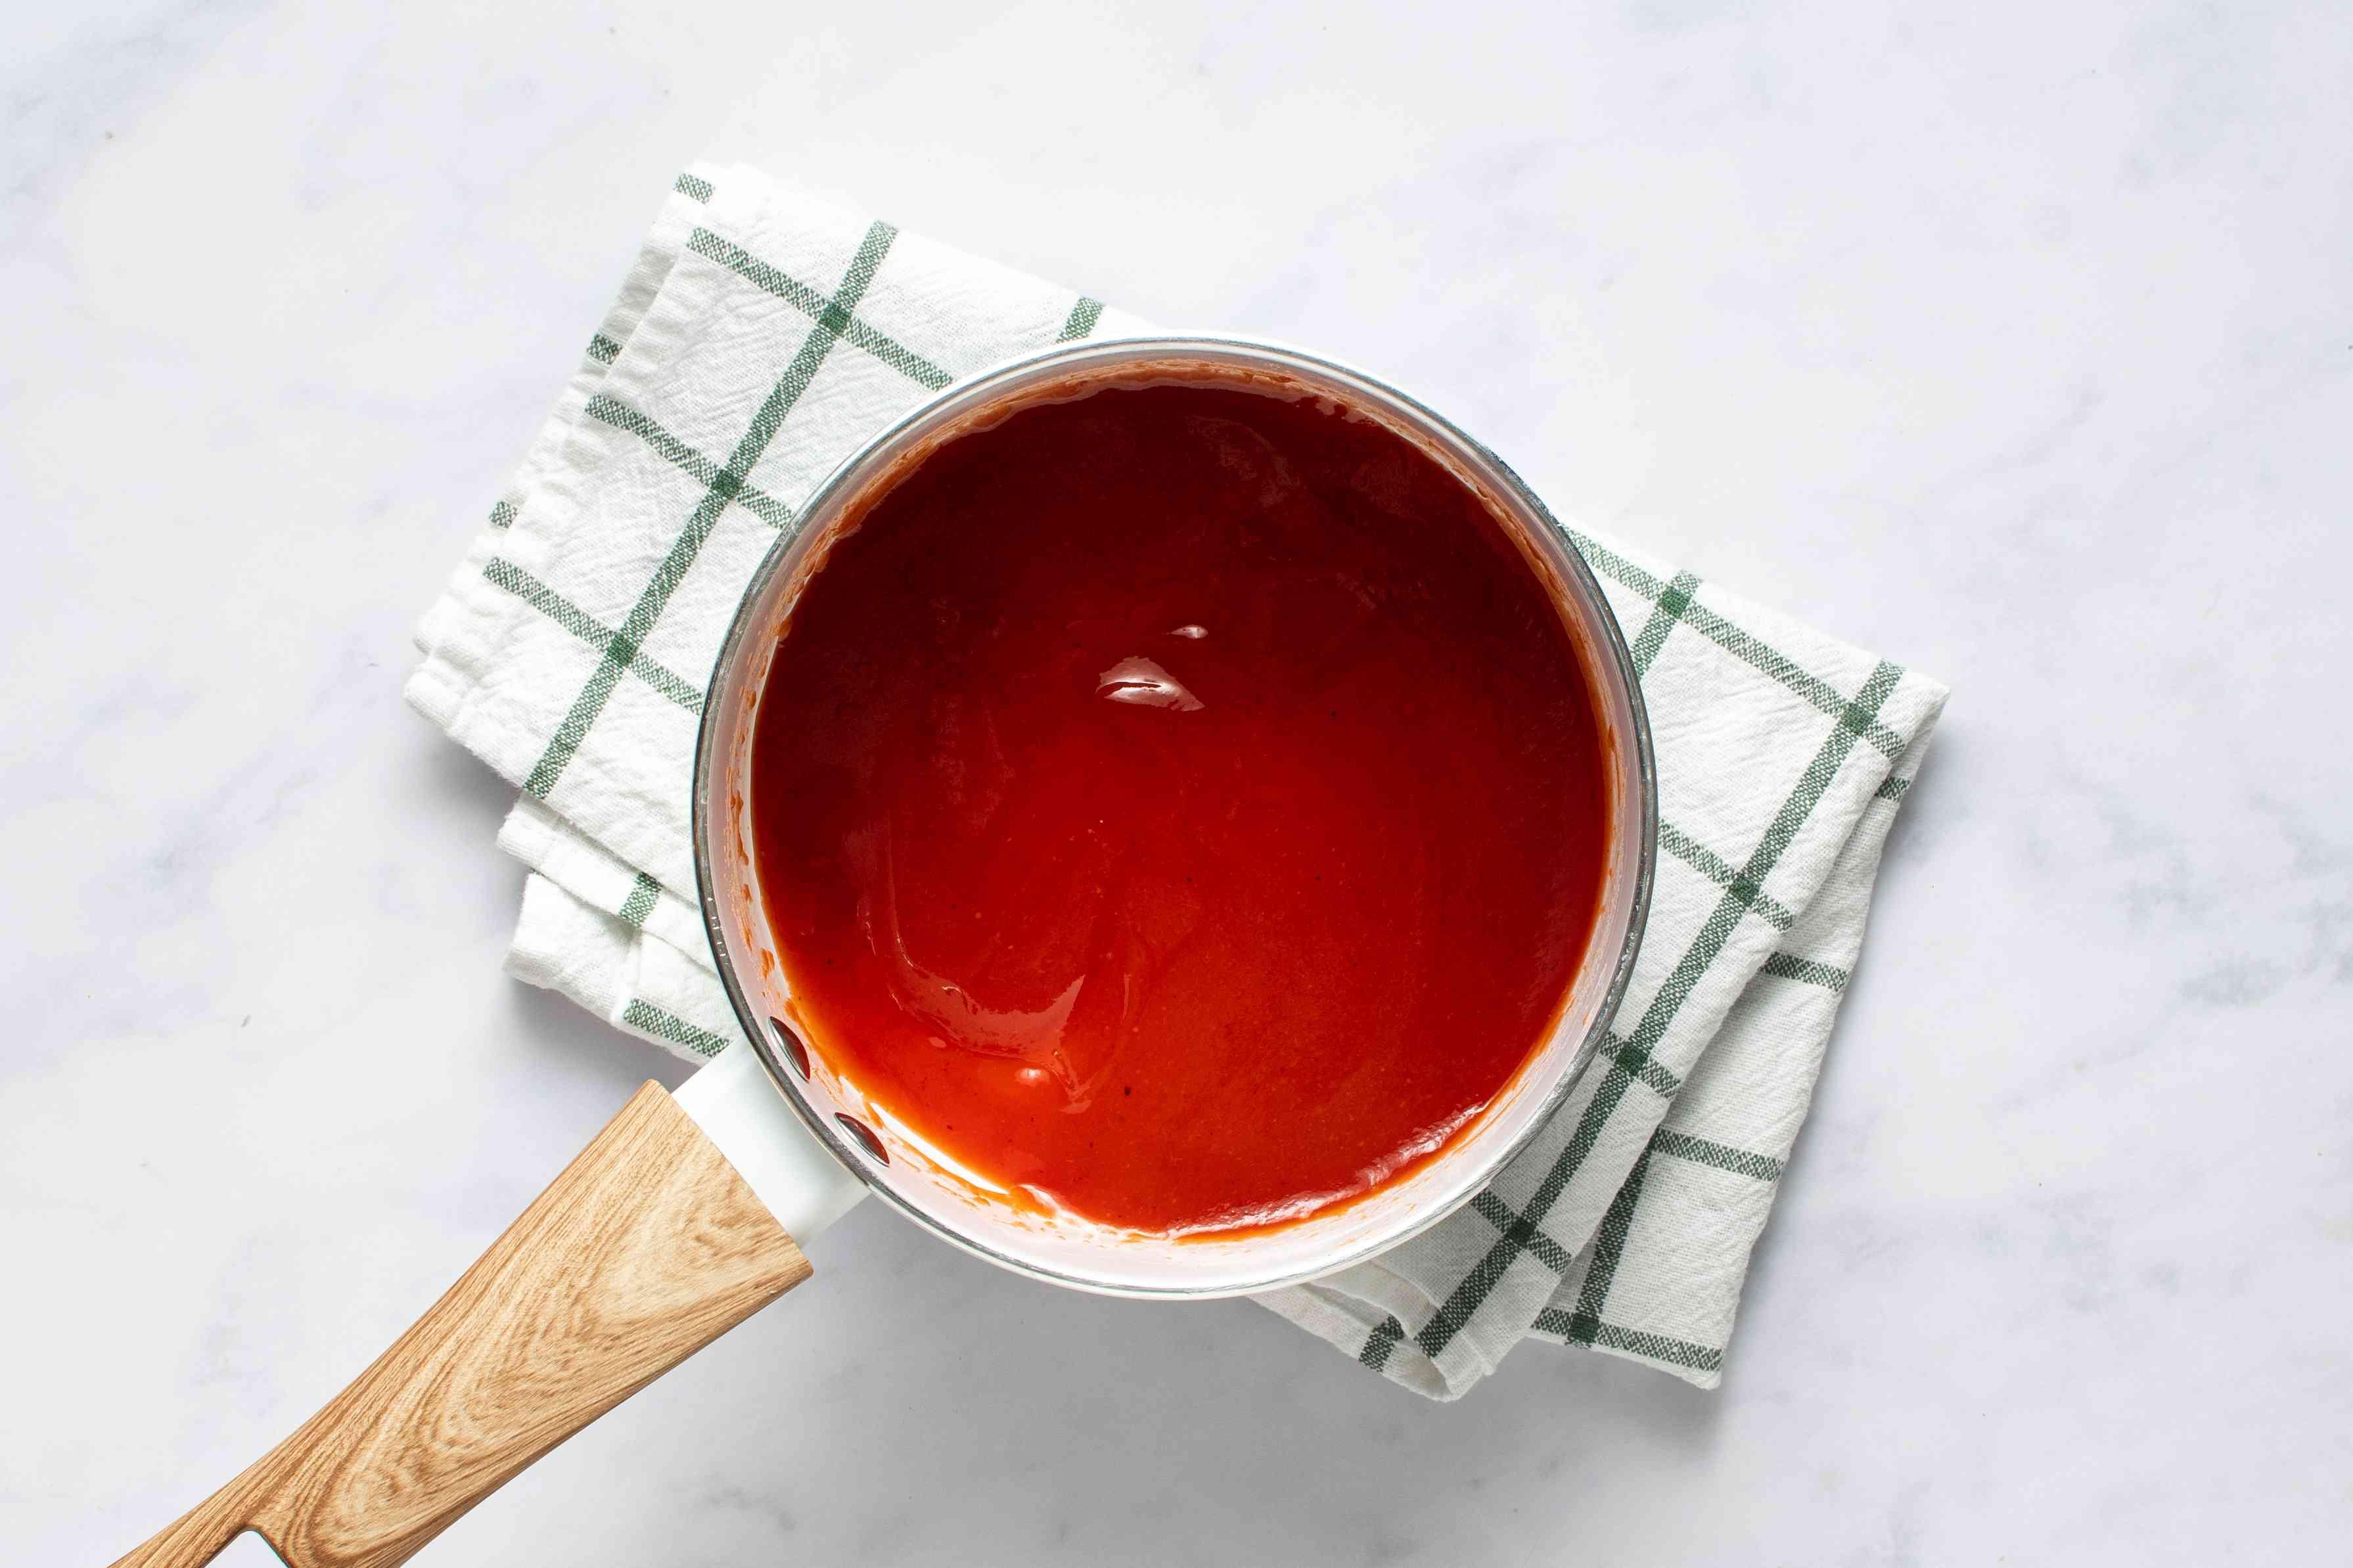 guava dipping sauce in a saucepan